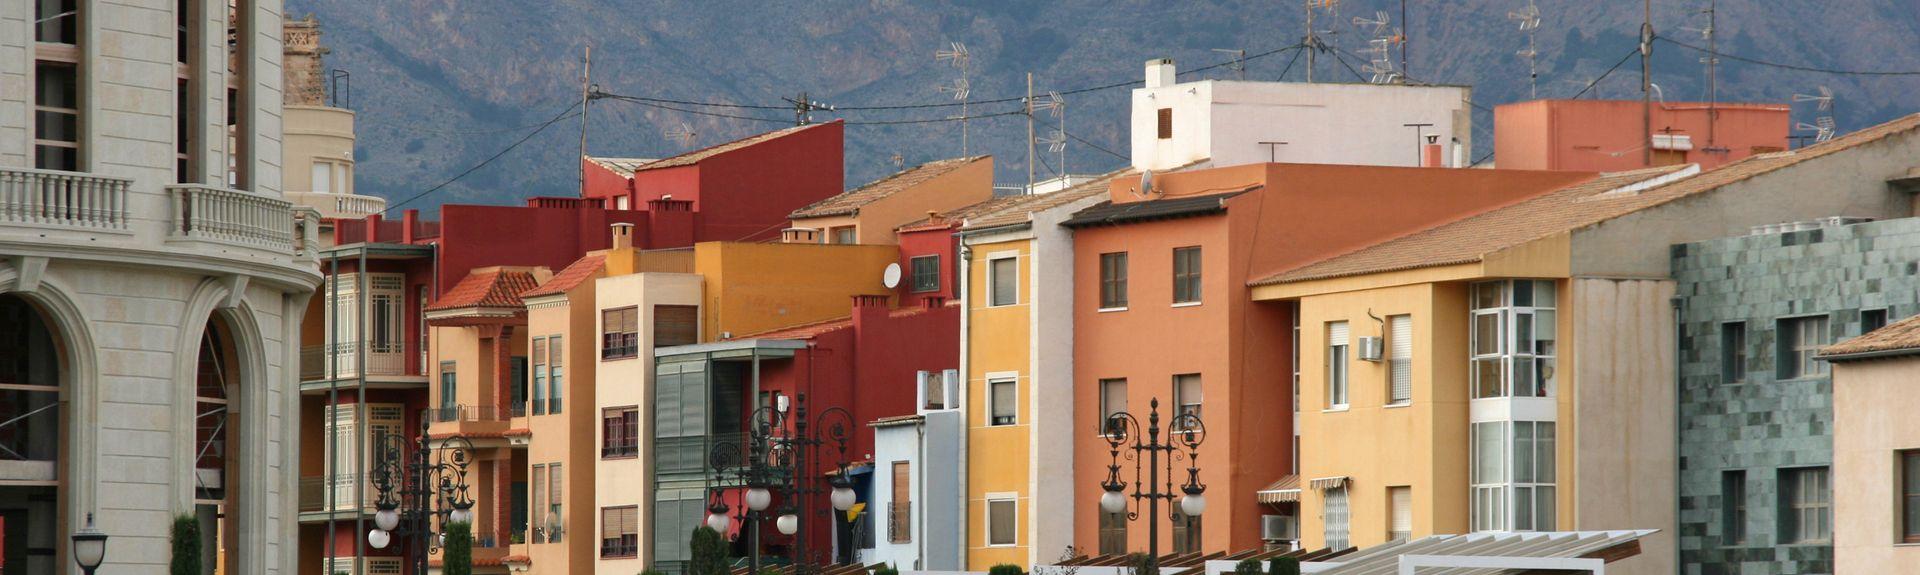 Orihuela, Valencian Community, Spain